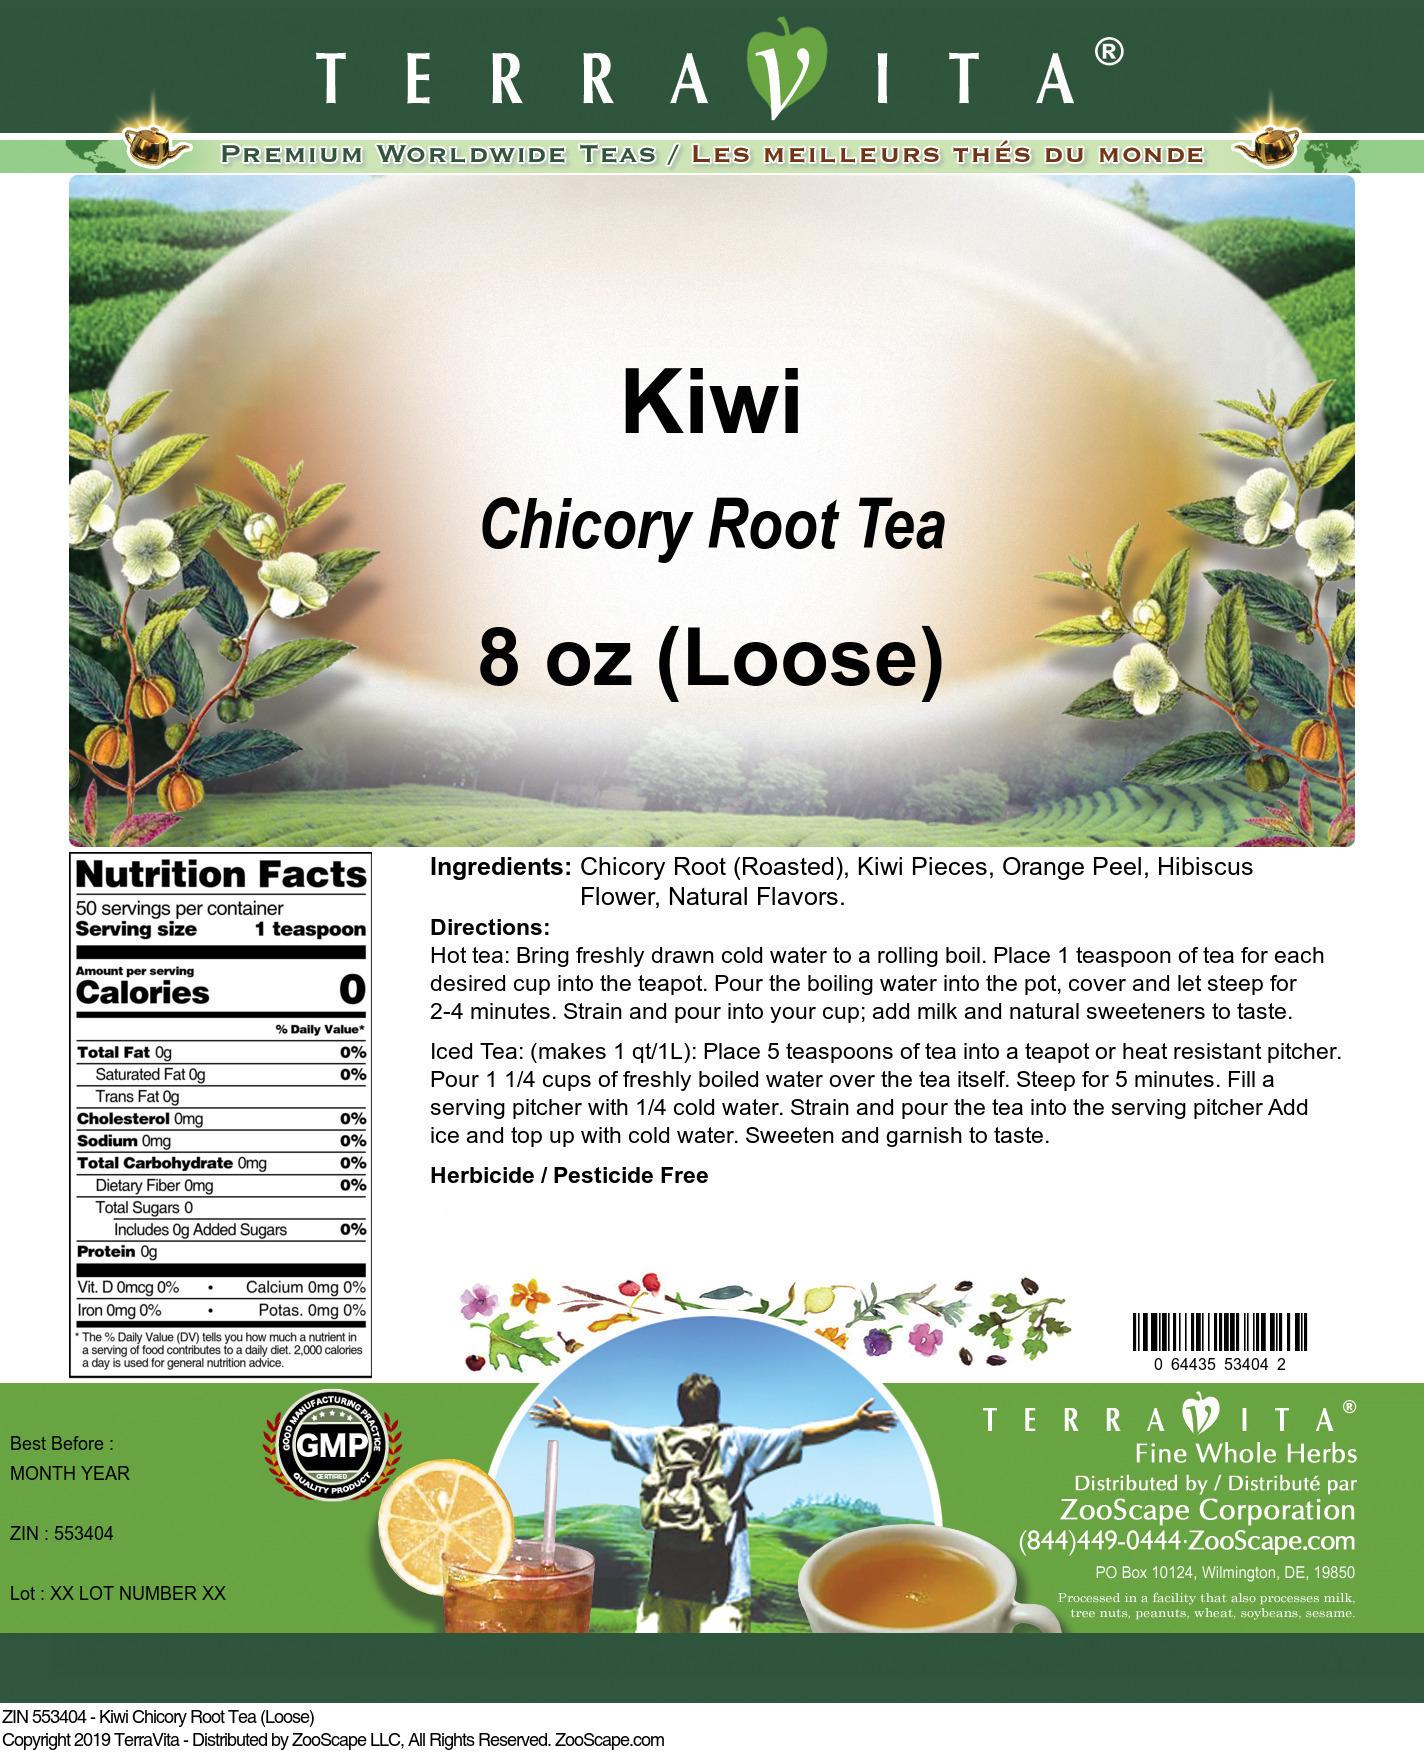 Kiwi Chicory Root Tea (Loose)